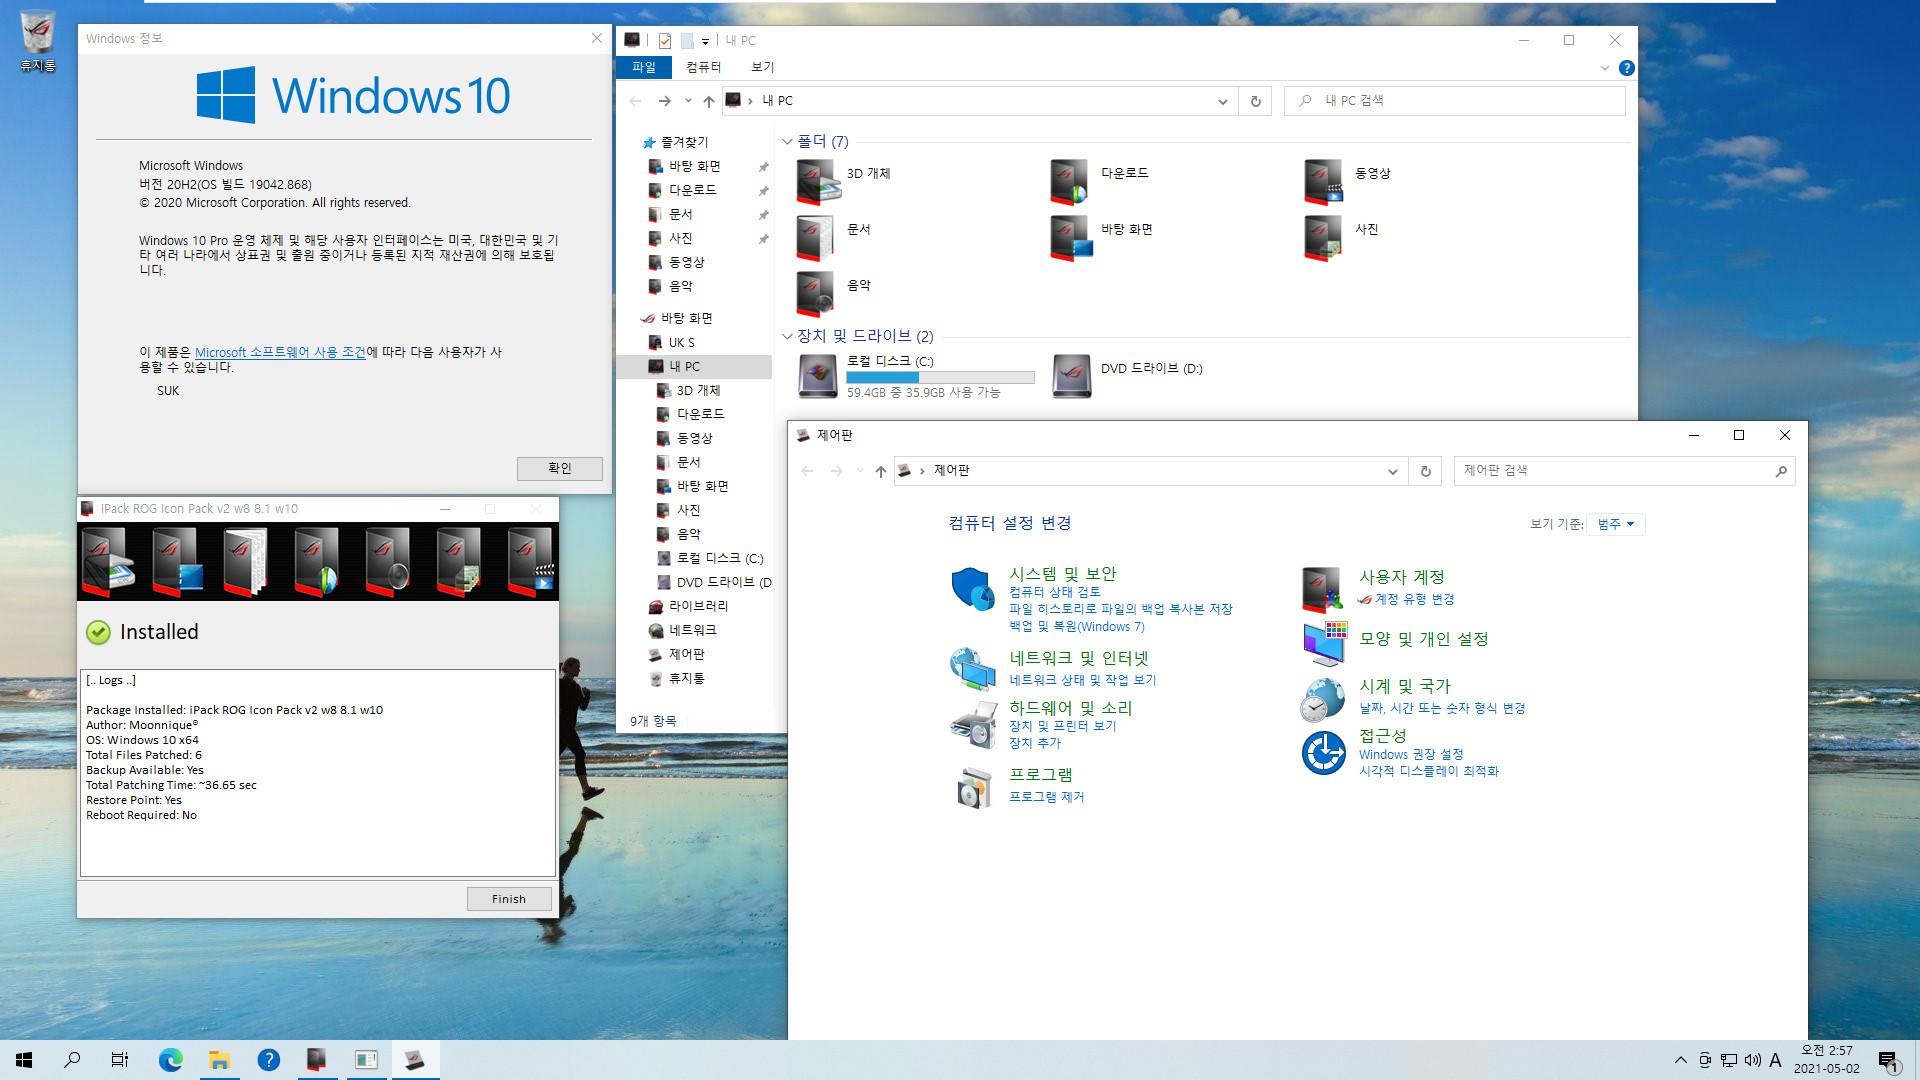 imageres.dll적용 테스트 - Windows 10 ROG 아이콘팩으로 설치해도 제어판이 사용자 계정만 변경되네요 2021-05-02_025733.jpg